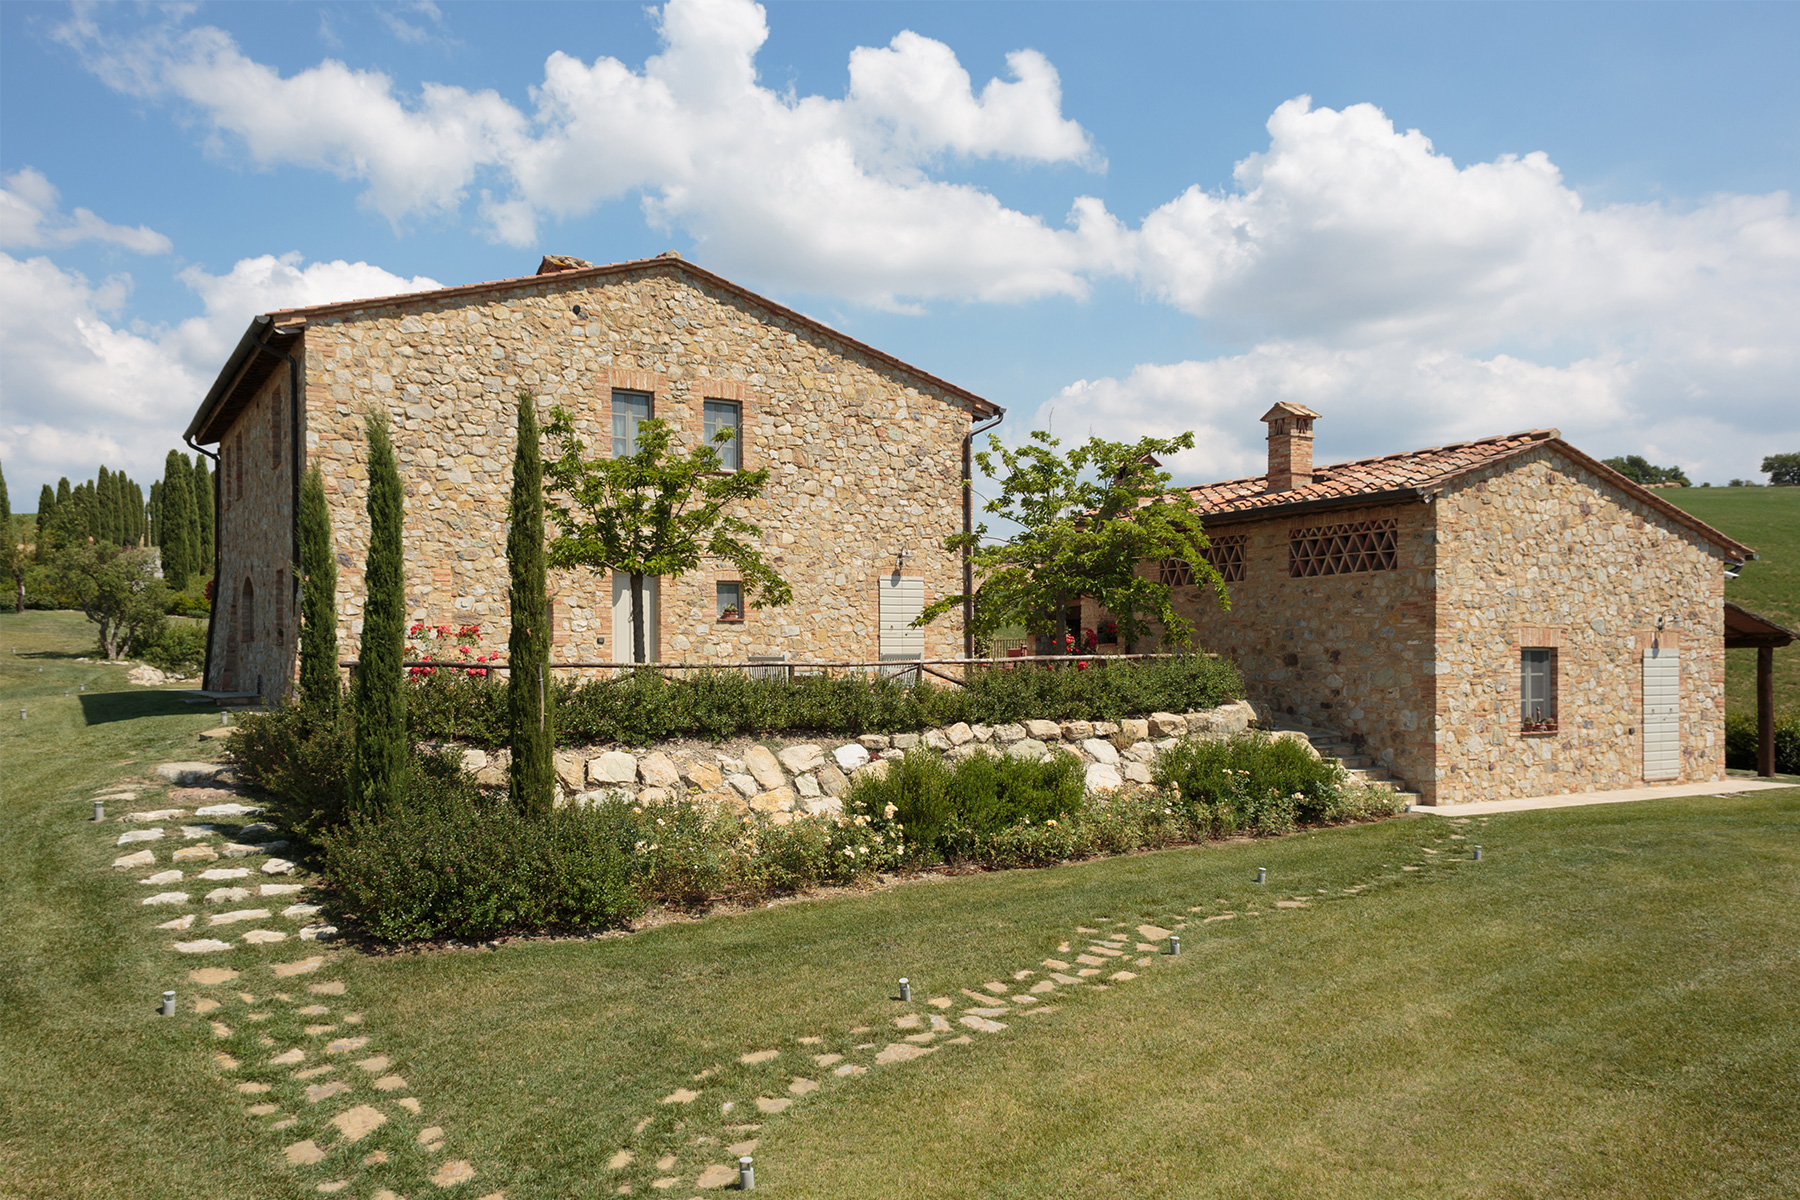 Additional photo for property listing at Charming Retreat near Casole d'Elsa and Volterra  Casole D Elsa, Siena 53031 Italia